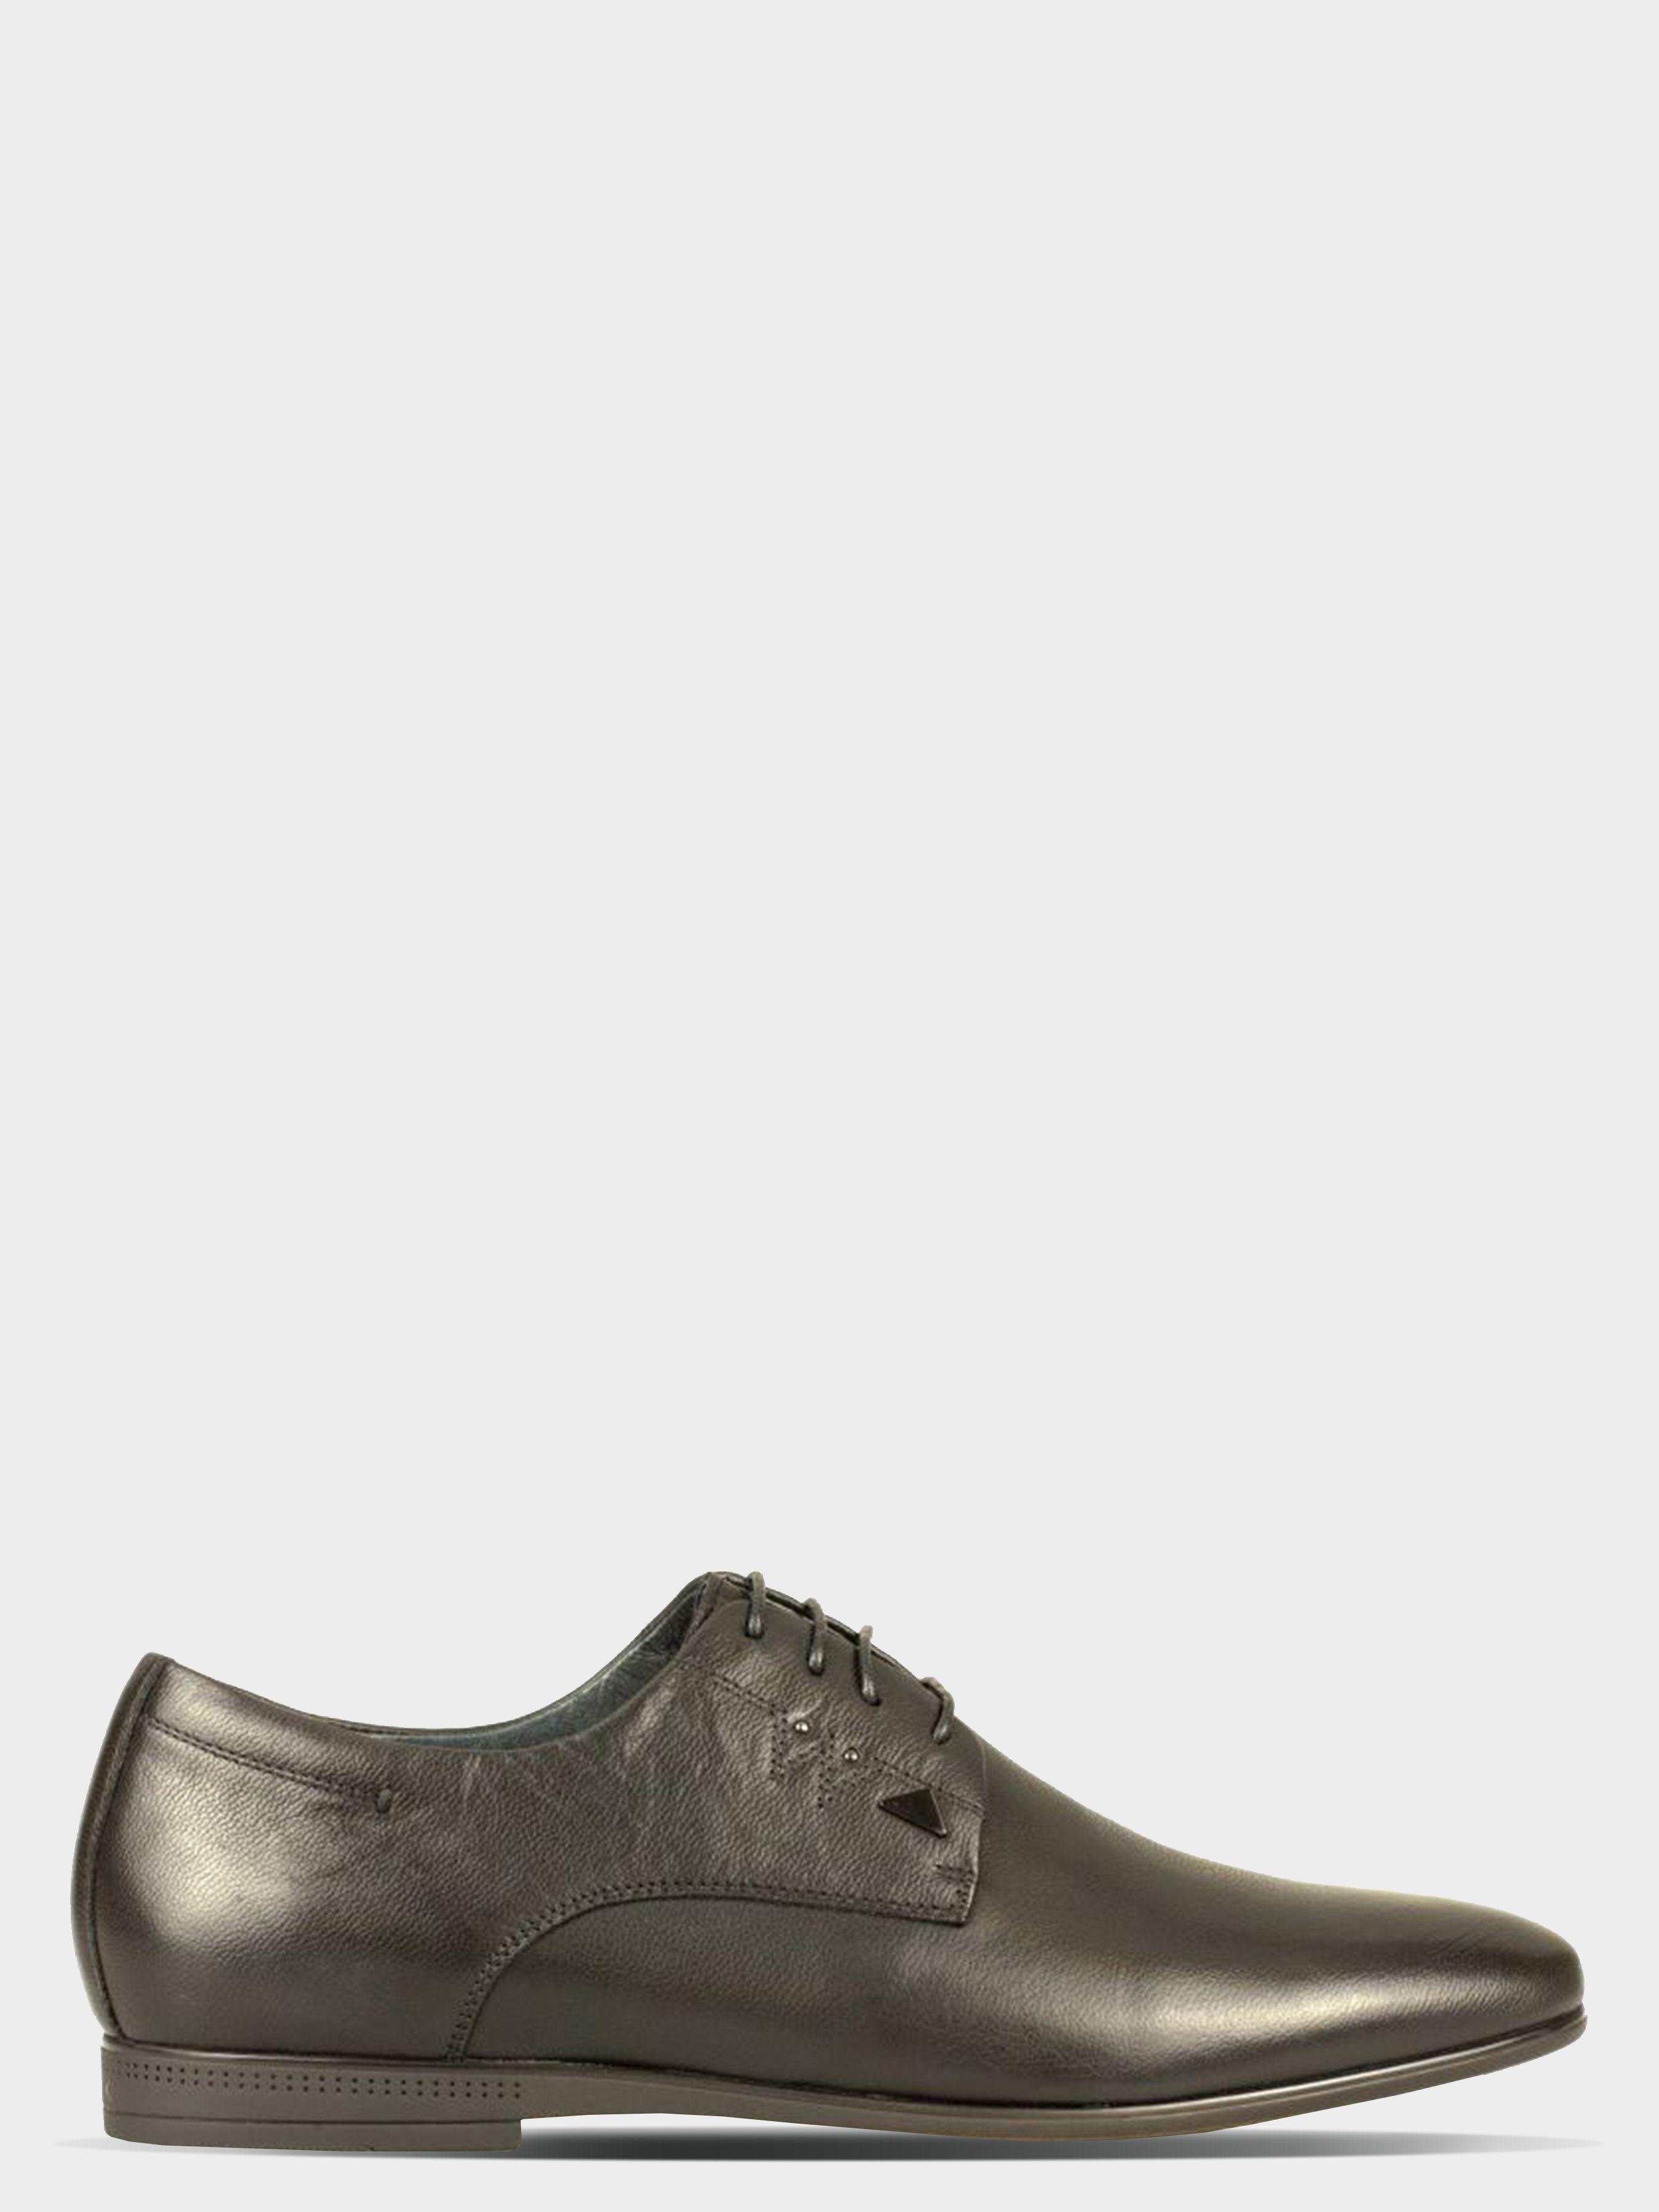 Туфли мужские Braska BR1499 цена обуви, 2017